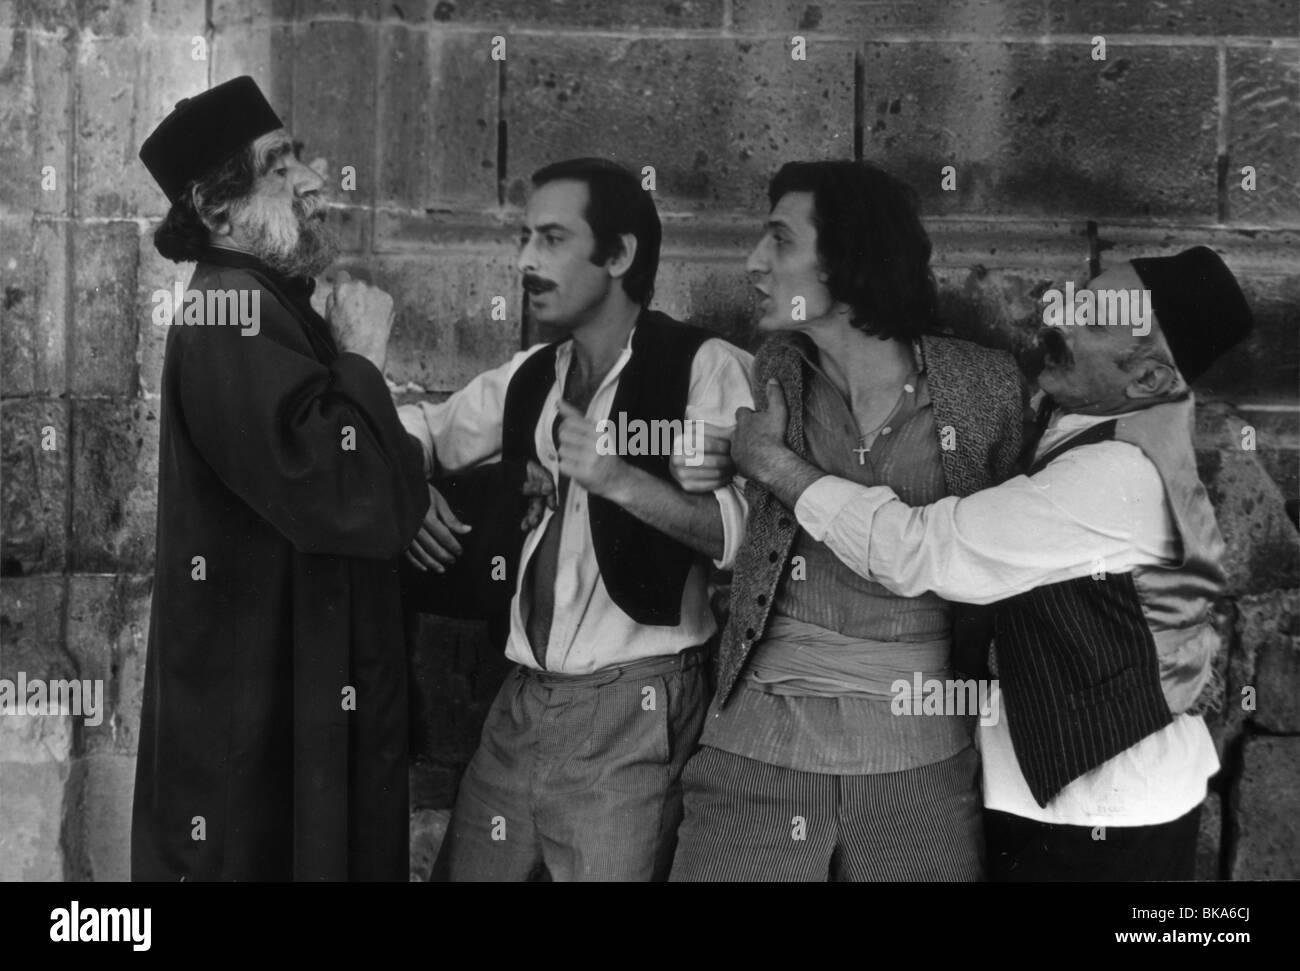 Me Ktor yerkinq Año : 1980 Director : Henrik Malyan, Ashot maliense Adamyan Guenrikh Imagen De Stock